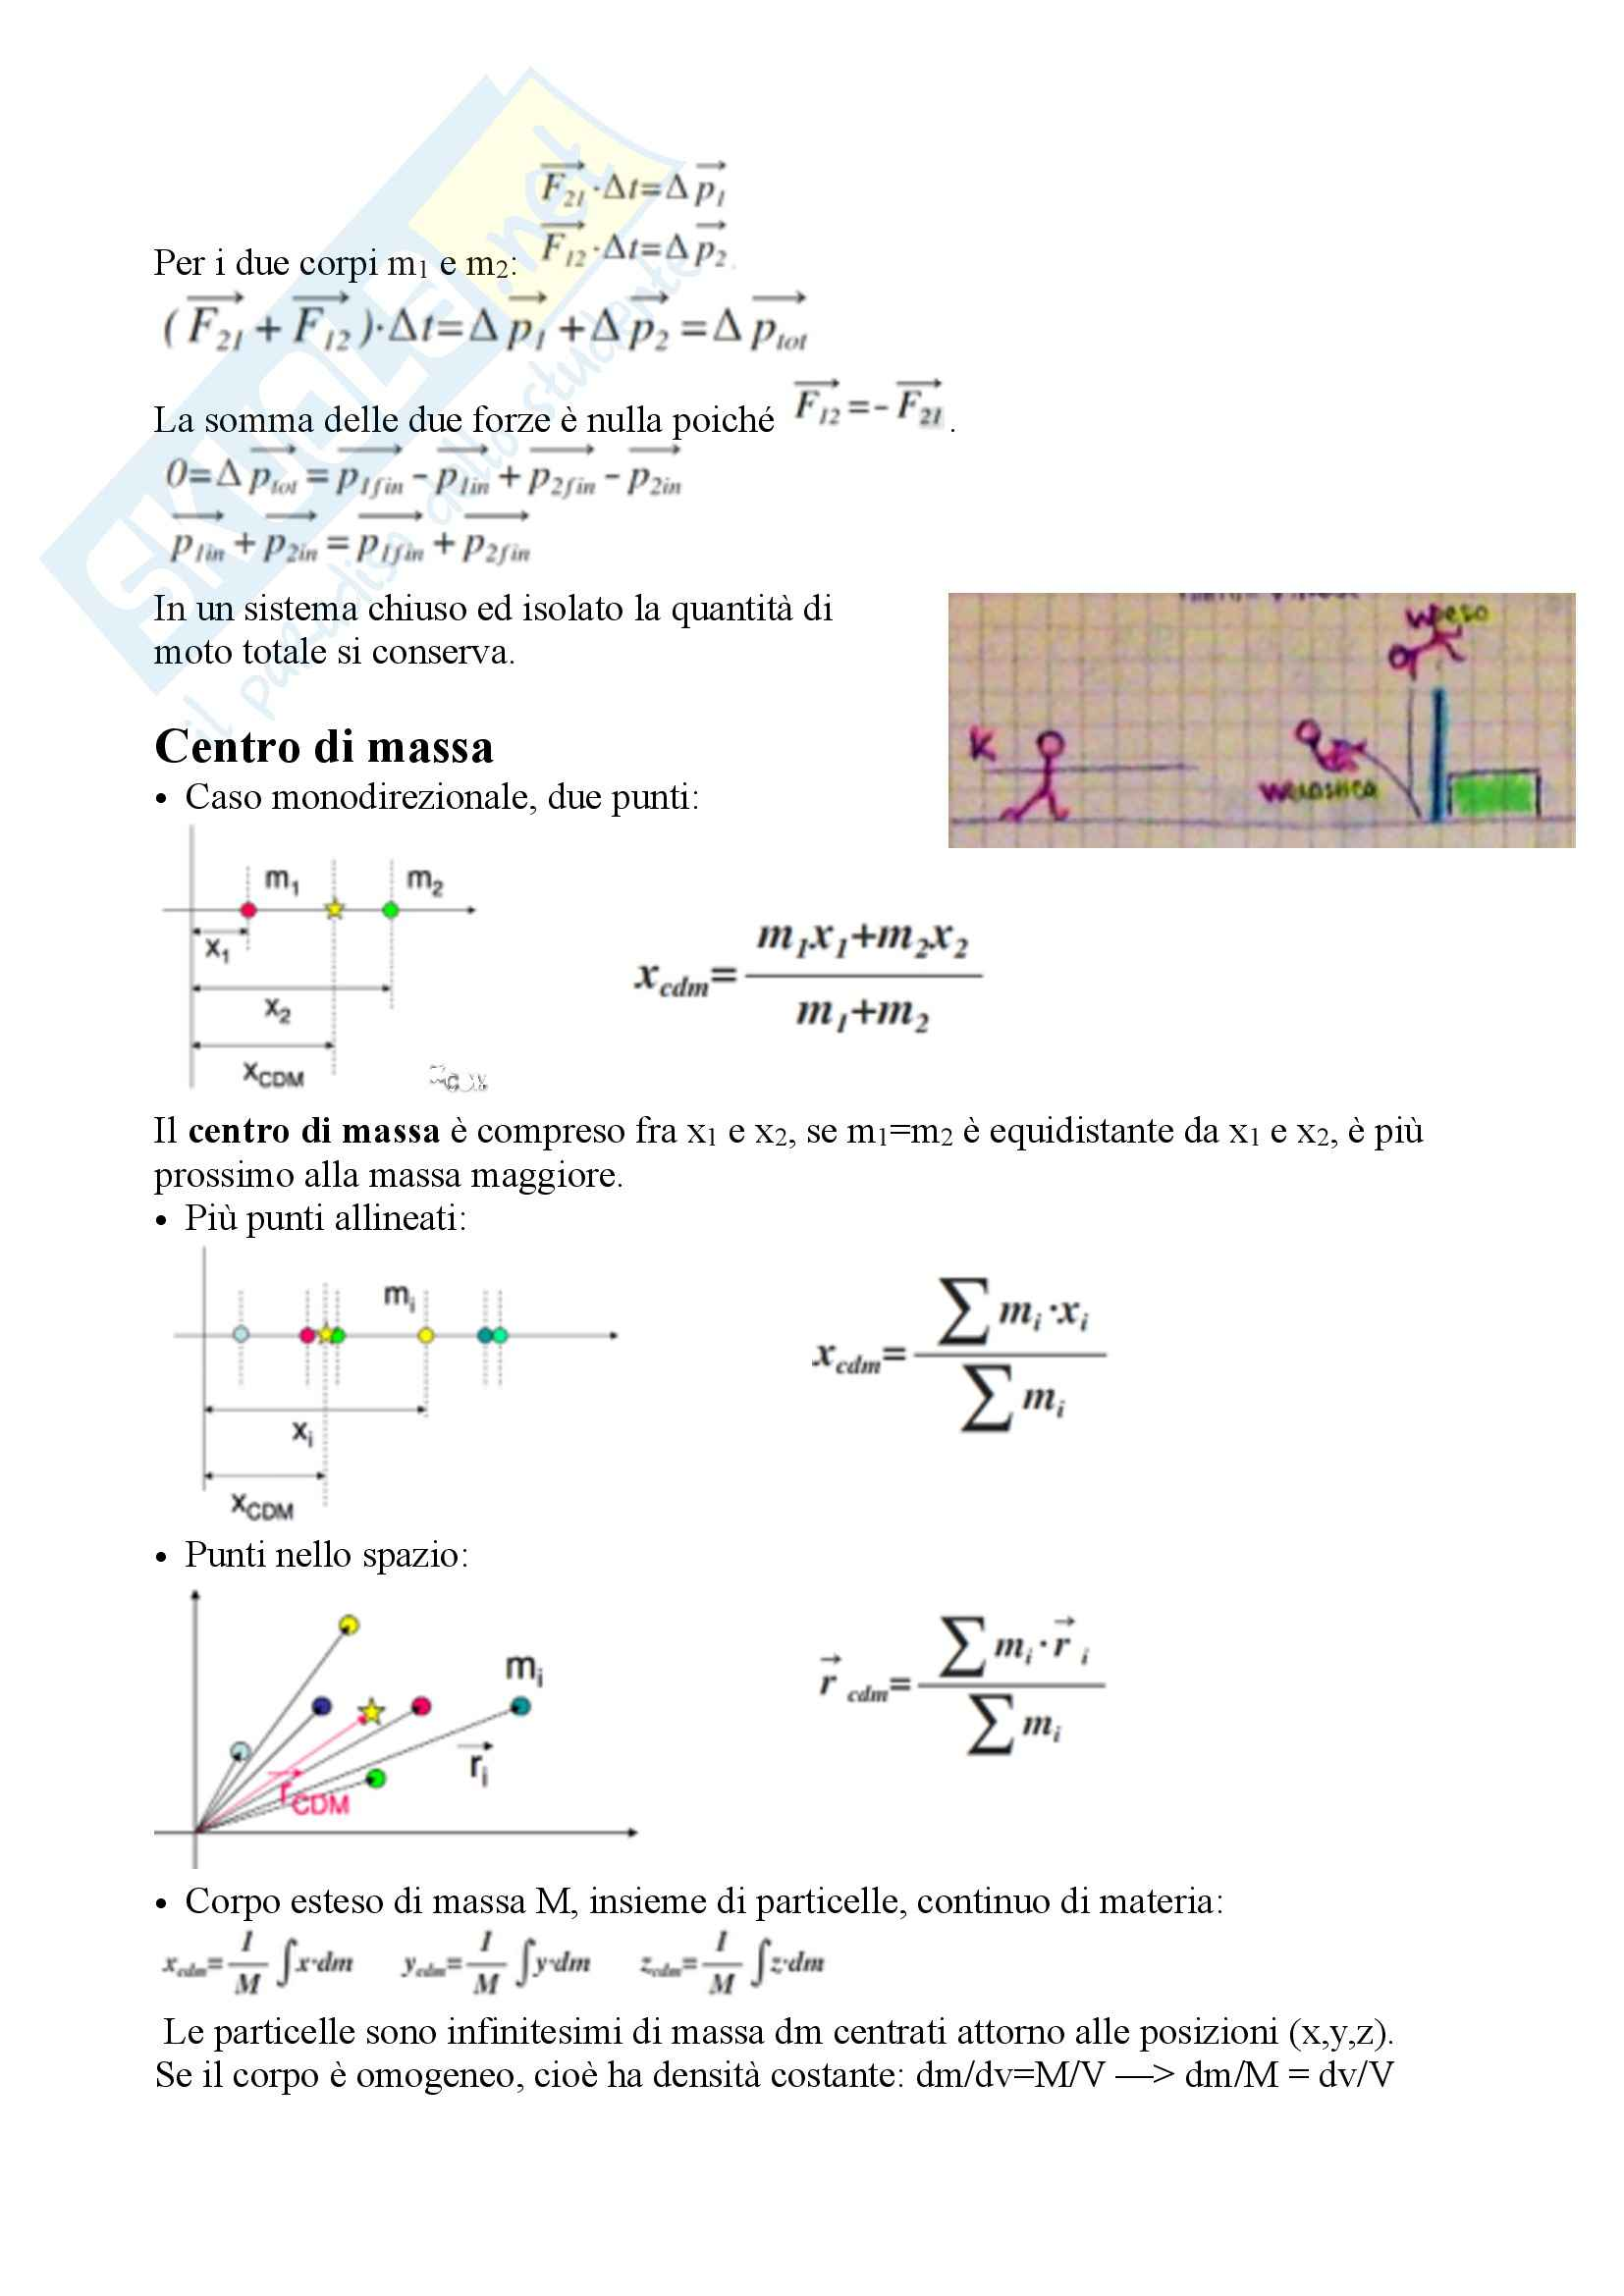 Fisica Medica - Appunti Pag. 16